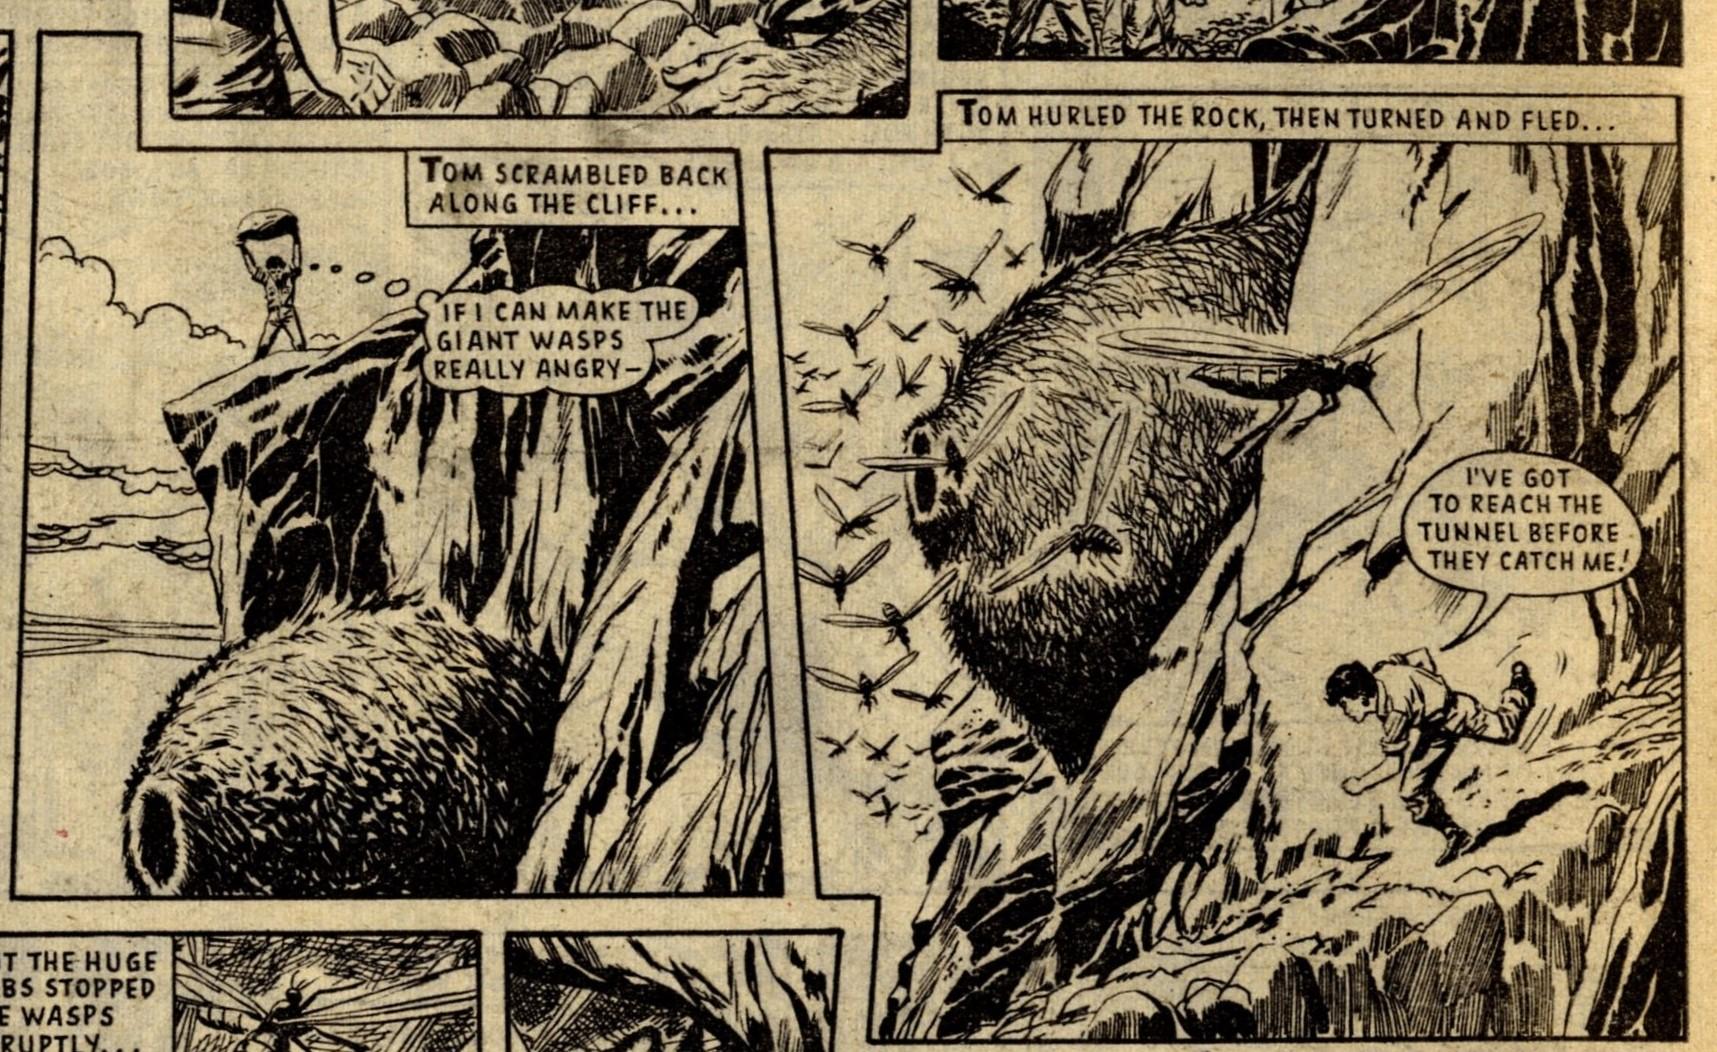 The Terrible Trail to Tolmec: Massimo Belardinelli (artist)